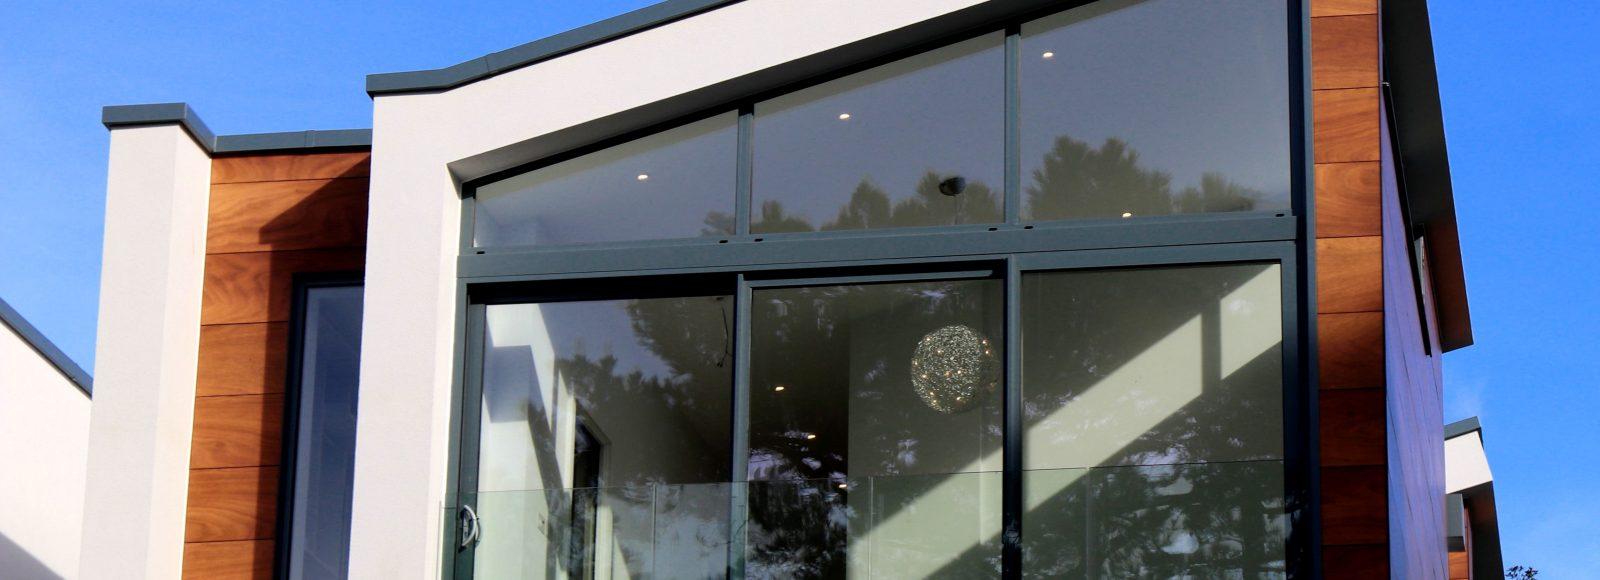 apartment-architectural-design-architecture-323776